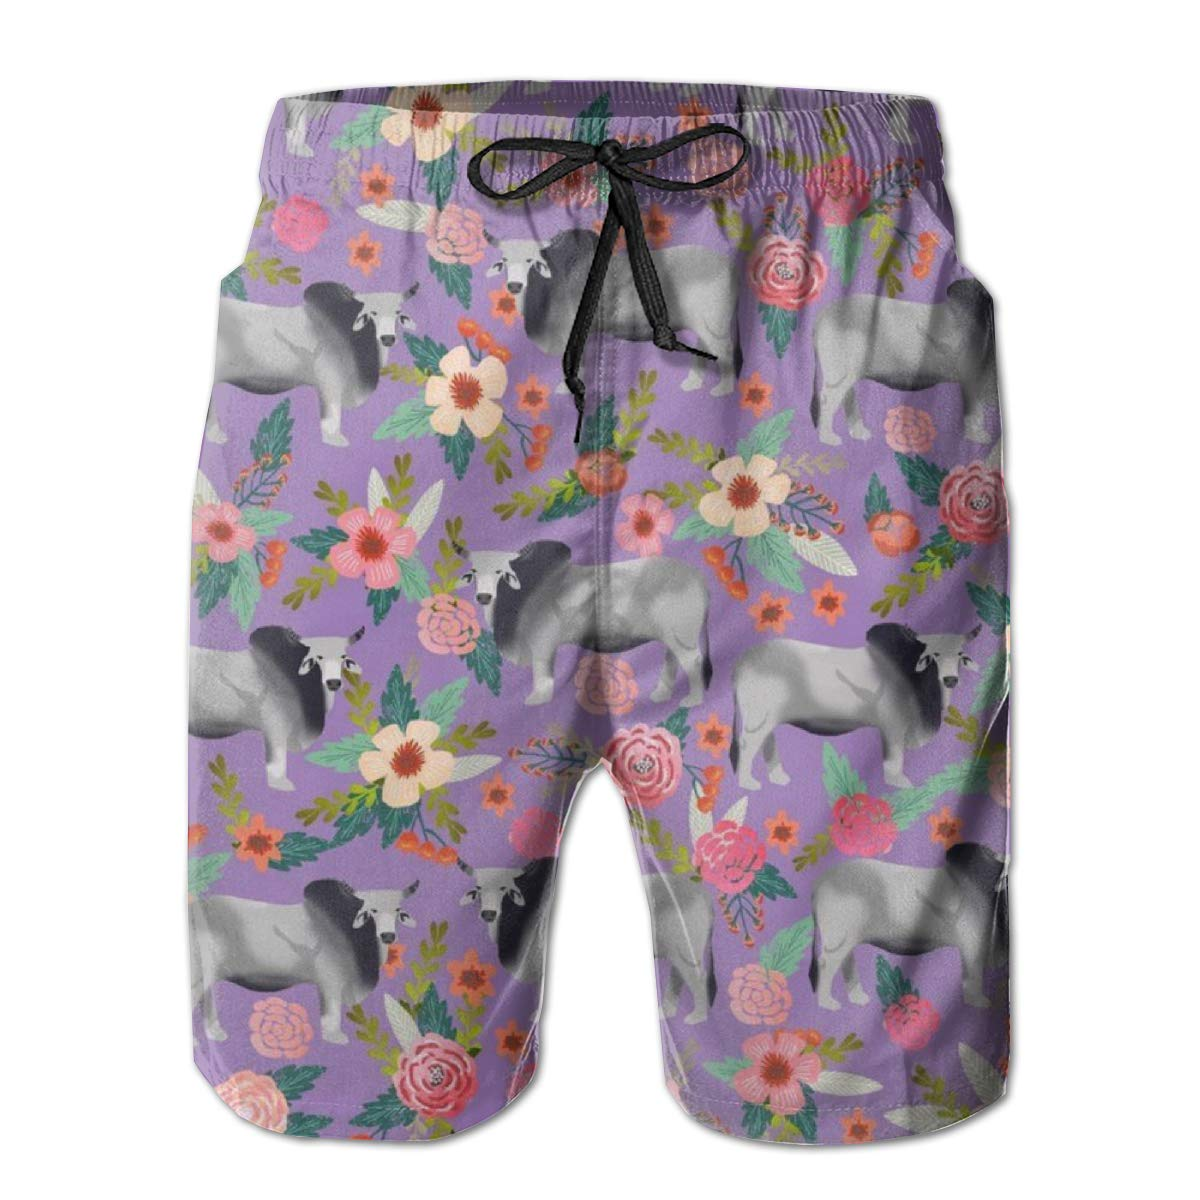 Classic Mens Swim Trunks Beach Shorts with Pockets British Shorthair Donuts